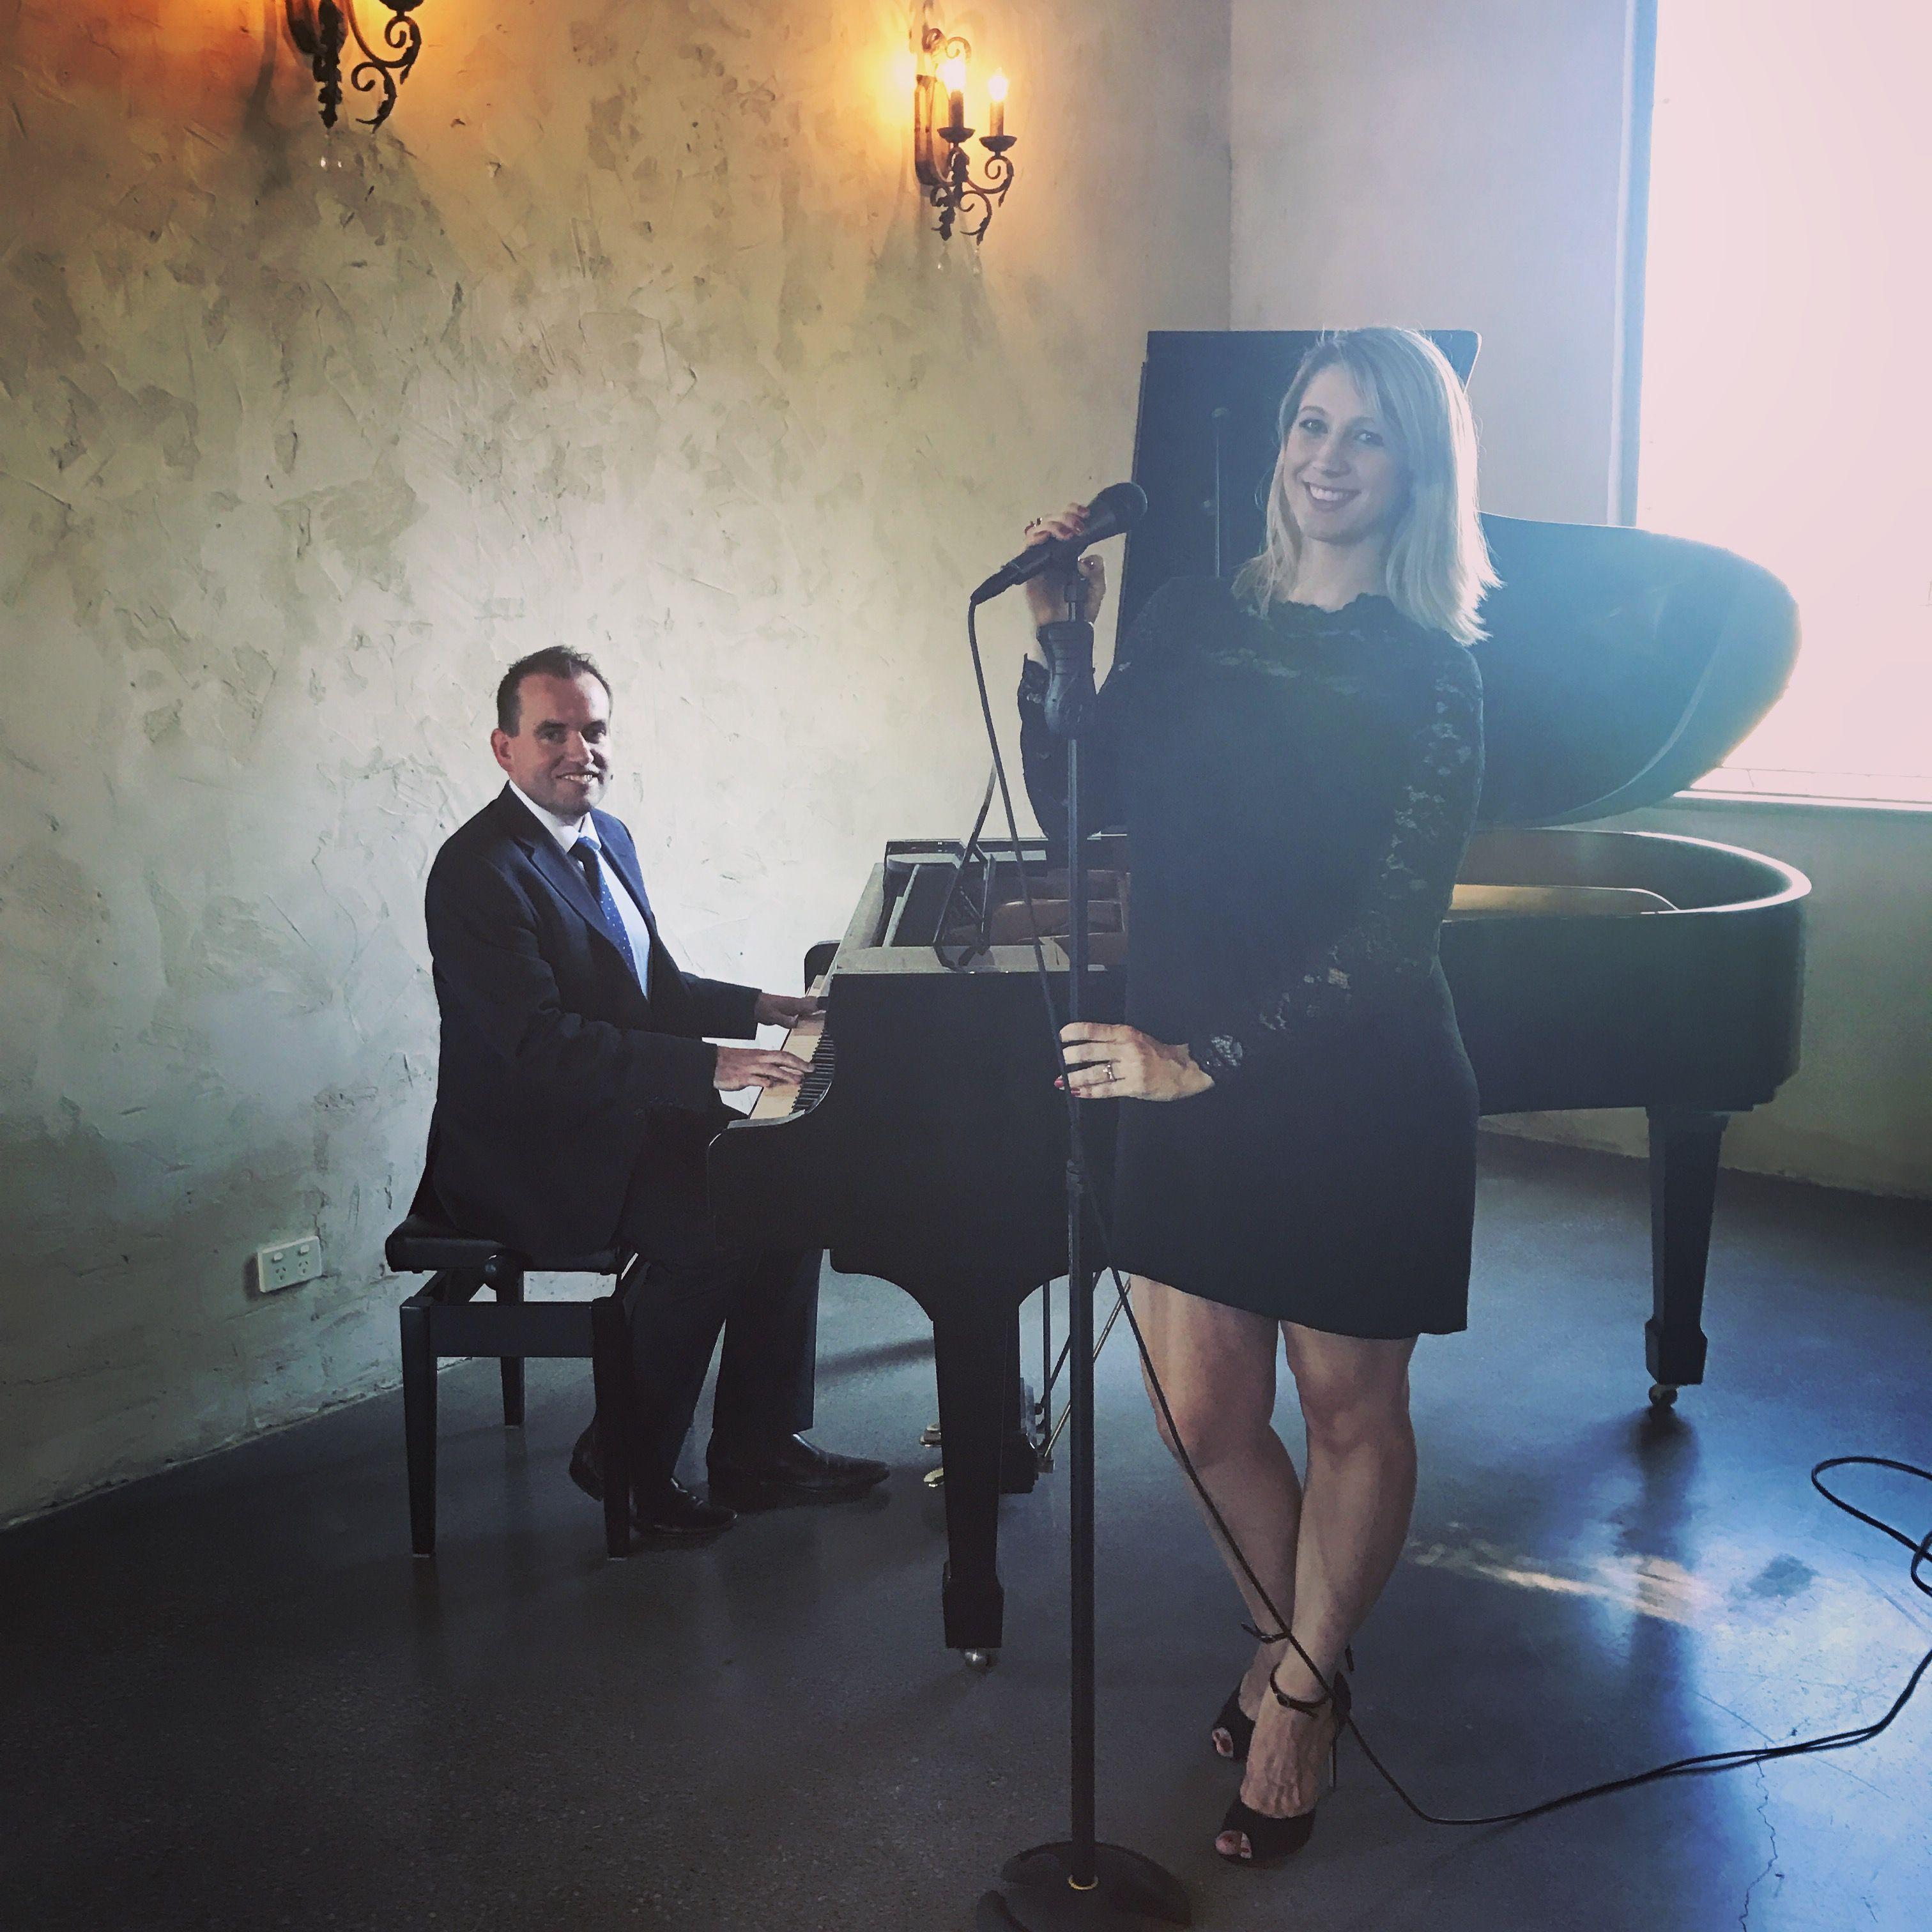 Wedding duo Paula Gentile and Benny Martin